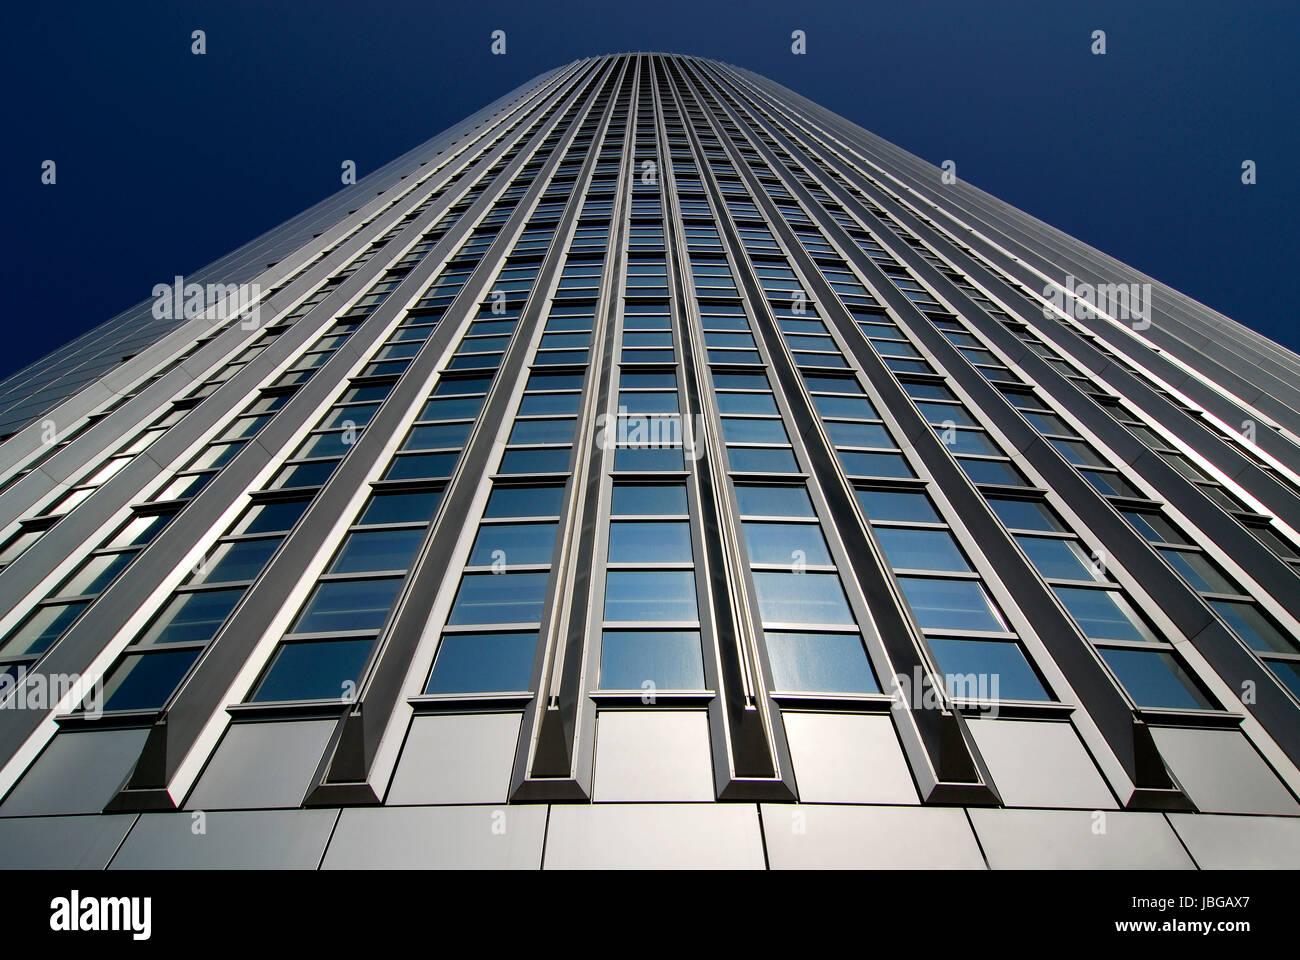 facade of a skyscraper - Stock Image